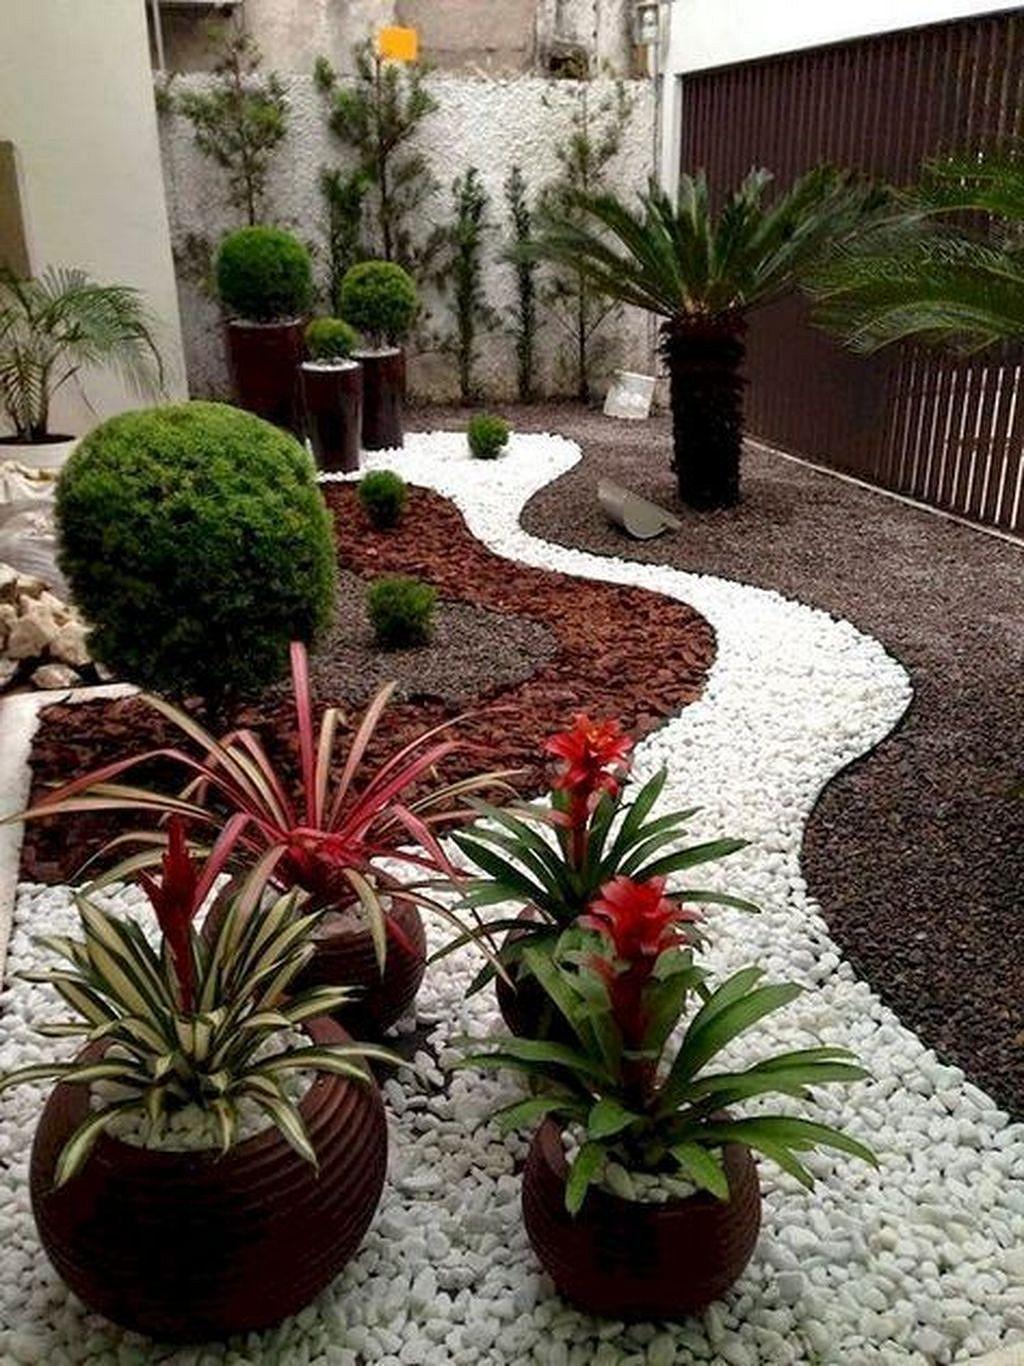 15 Appealing Small Dining Room Ideas: 15 Wonderful Front Yard Rock Garden Landscaping Ideas